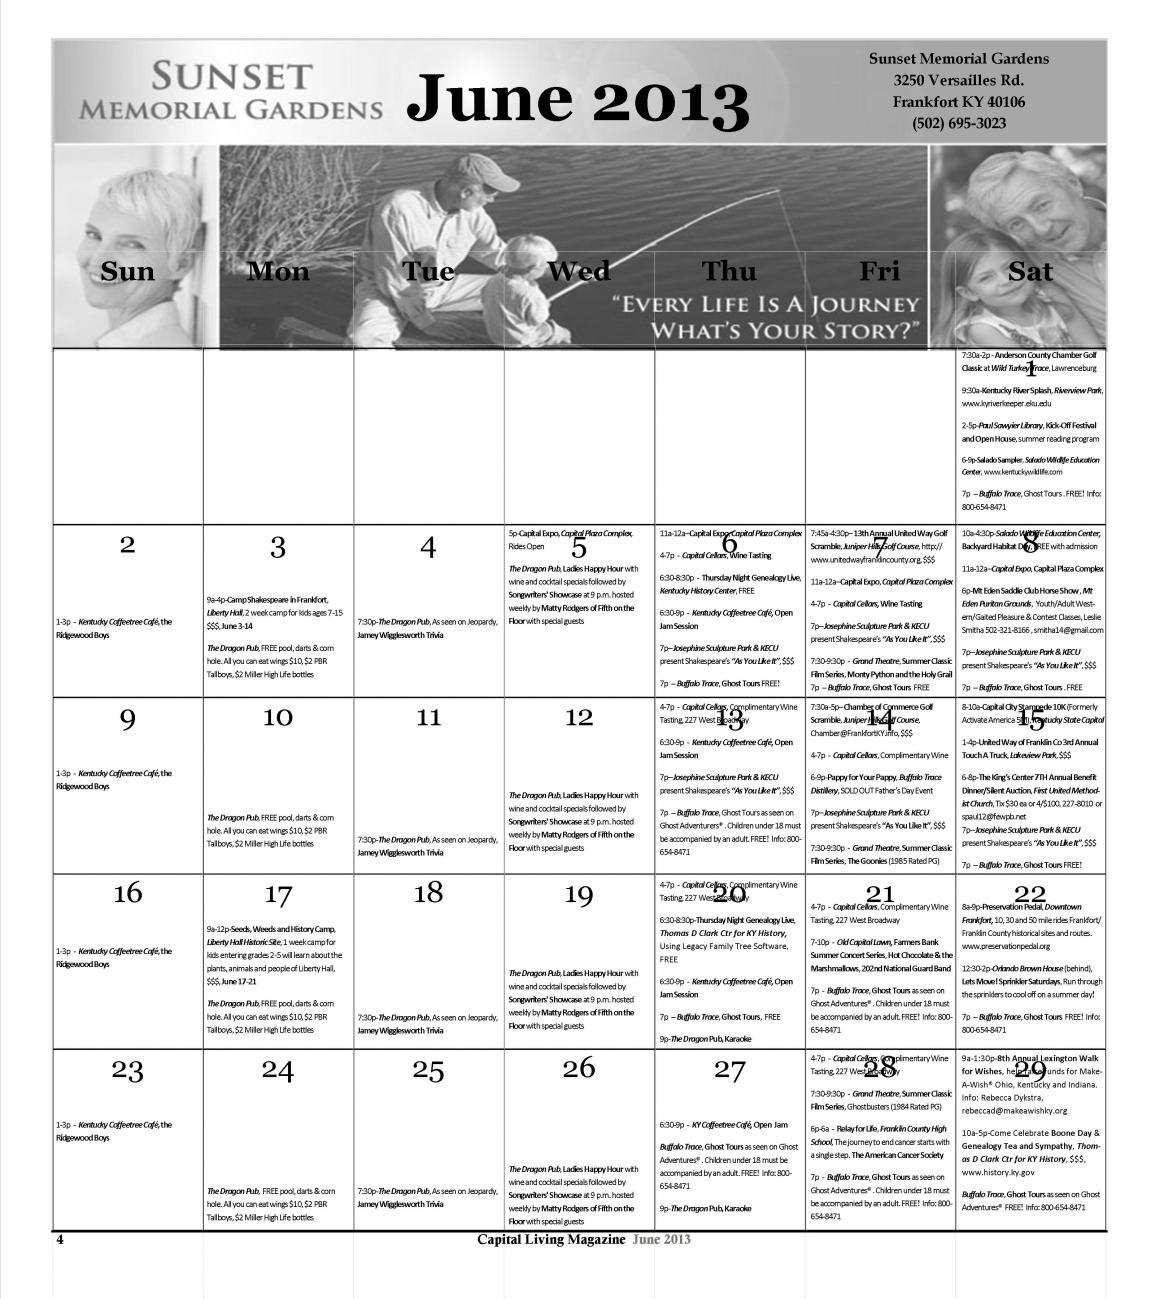 June 2013 Calendar-with sponsor